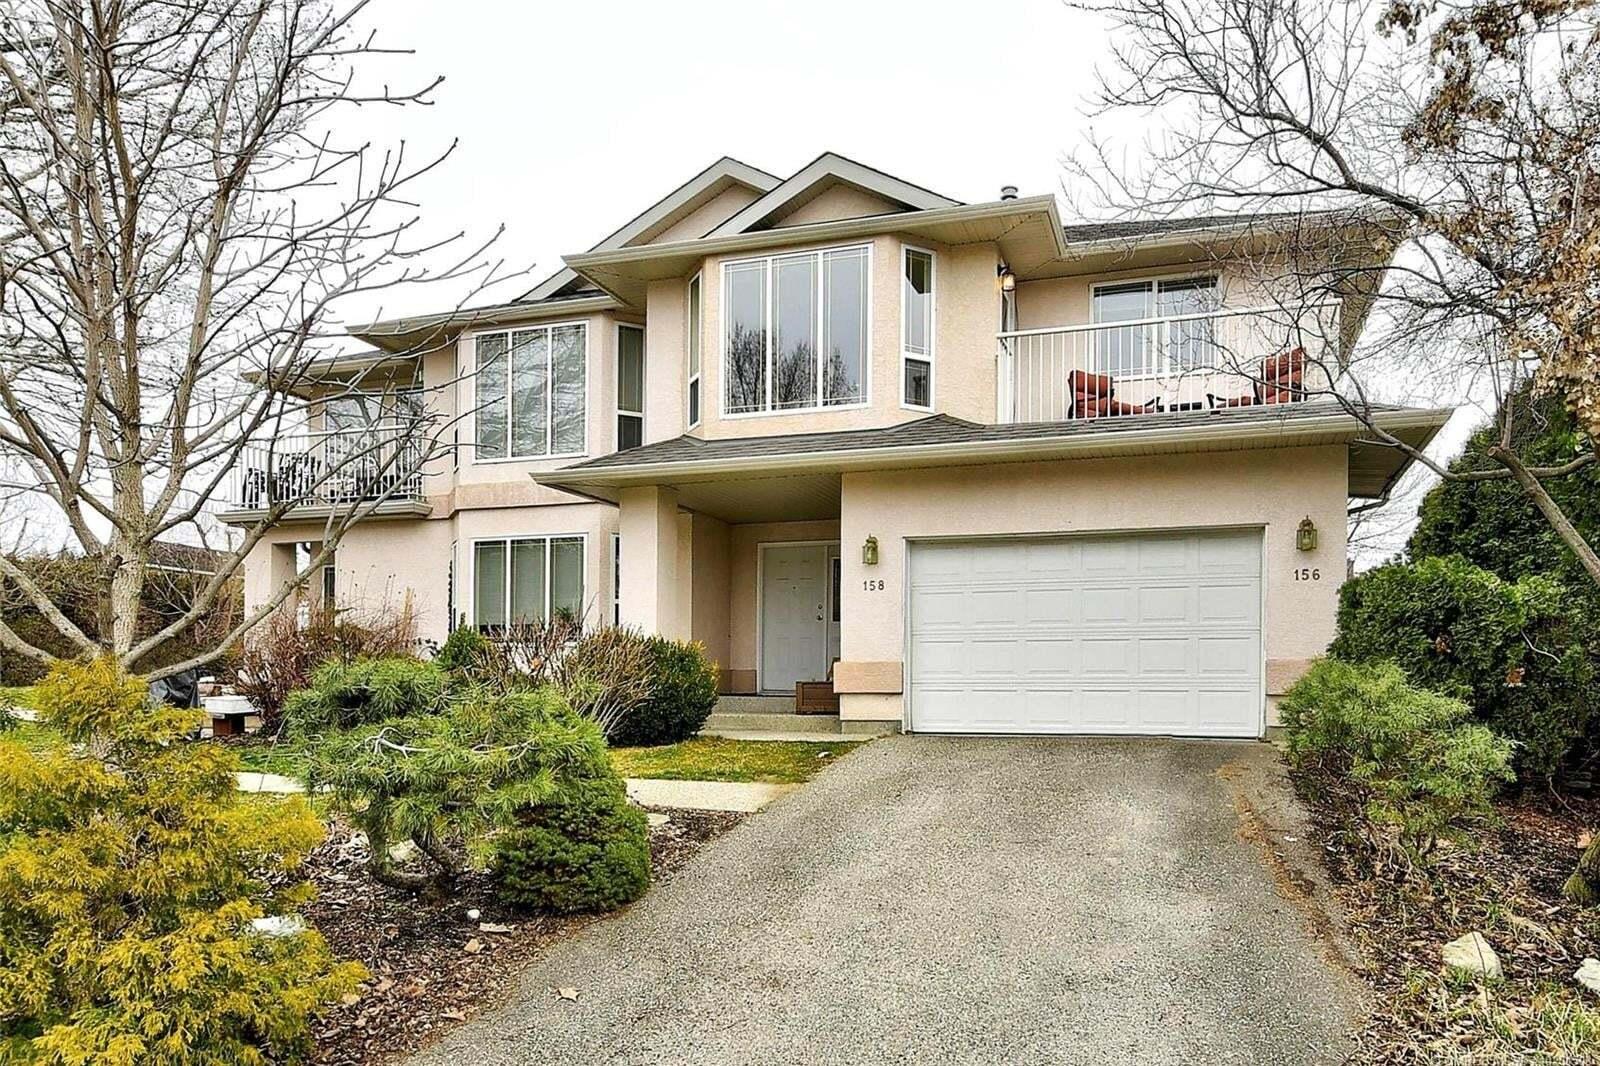 Townhouse for sale at 158 Wyndham Cres Kelowna British Columbia - MLS: 10201503